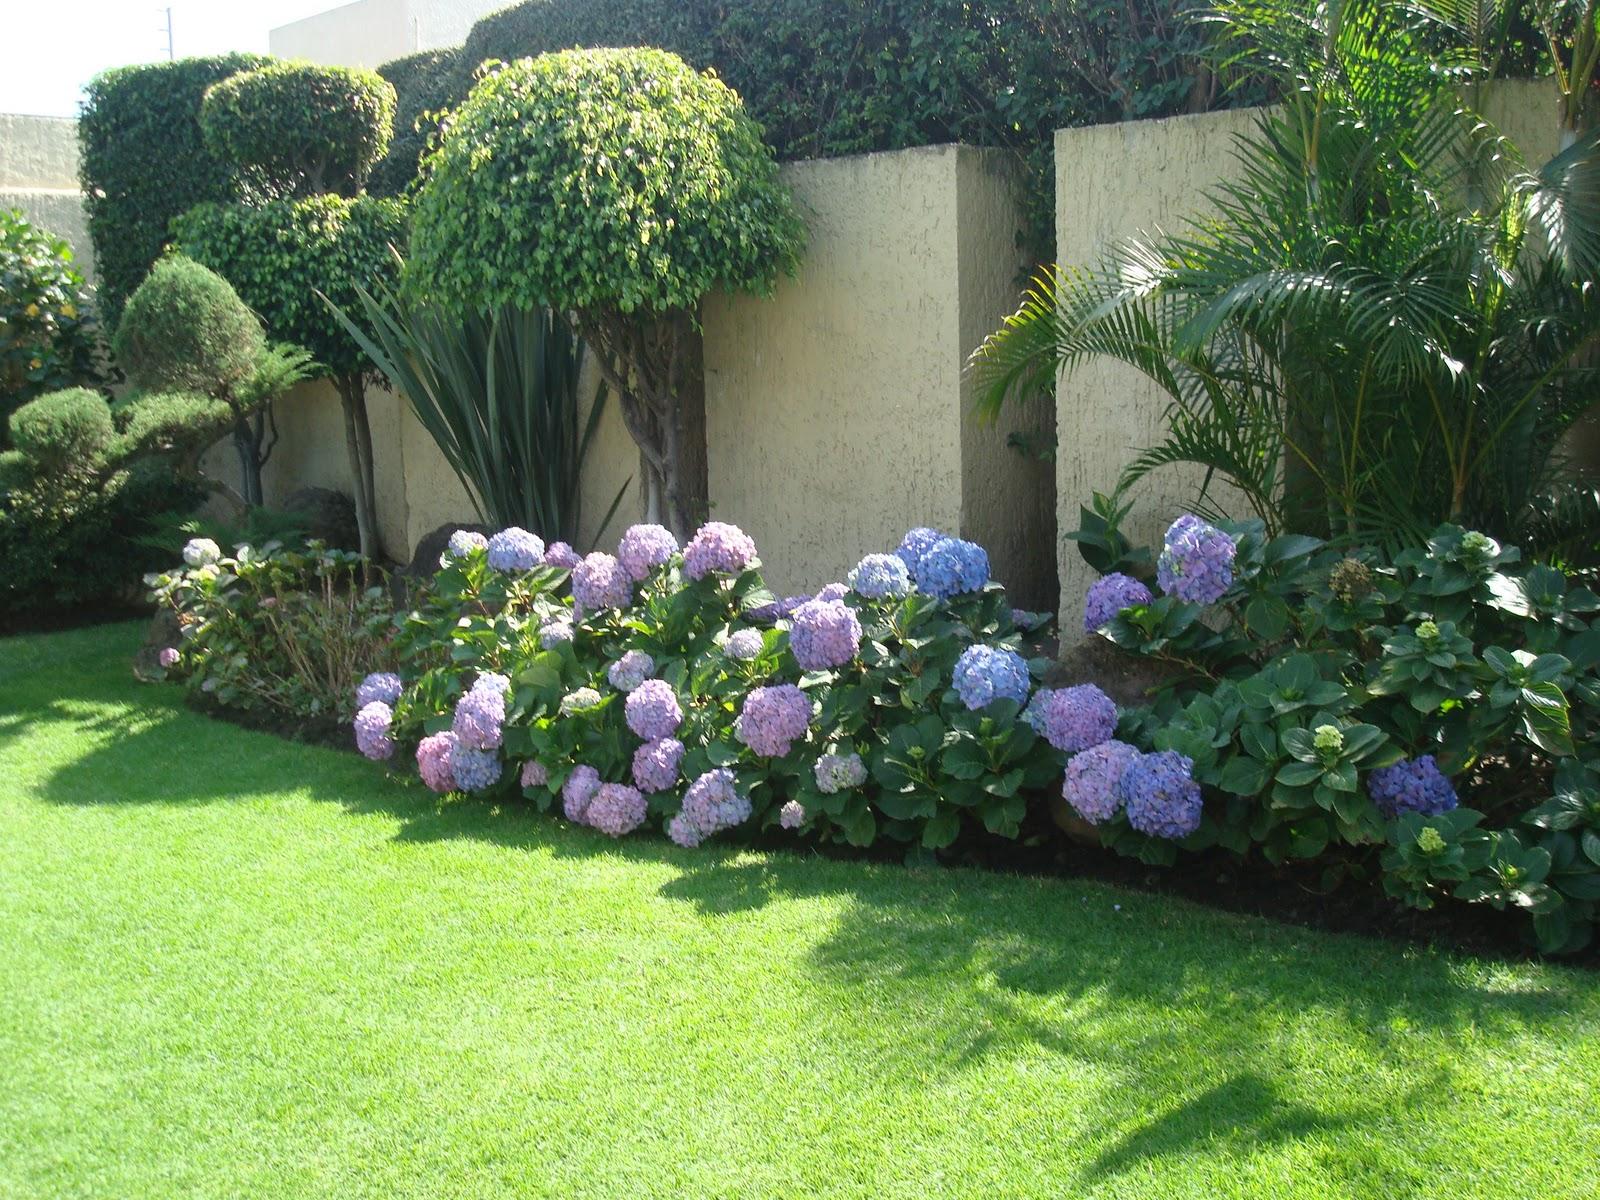 Sancarlosfortin flores de hortensias azules y jardin en - Piccoli giardini moderni ...